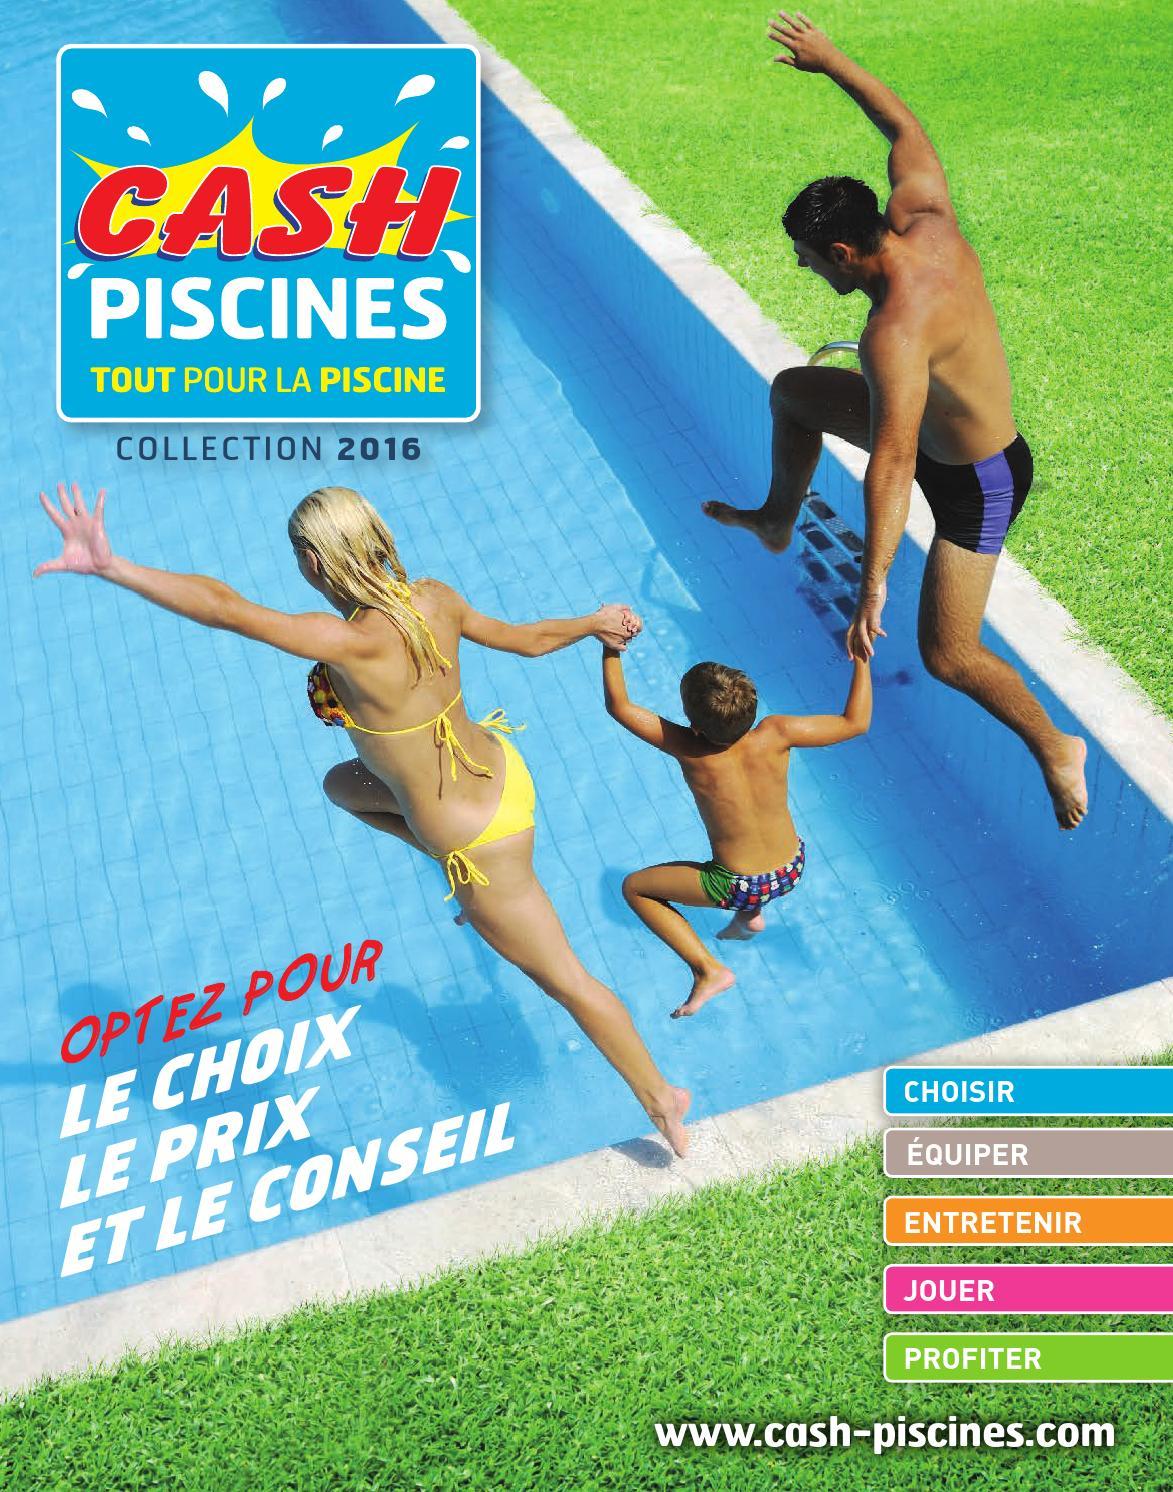 Cash Piscines 2016 By Octave Octave - Issuu avec Cash Piscine Lescar